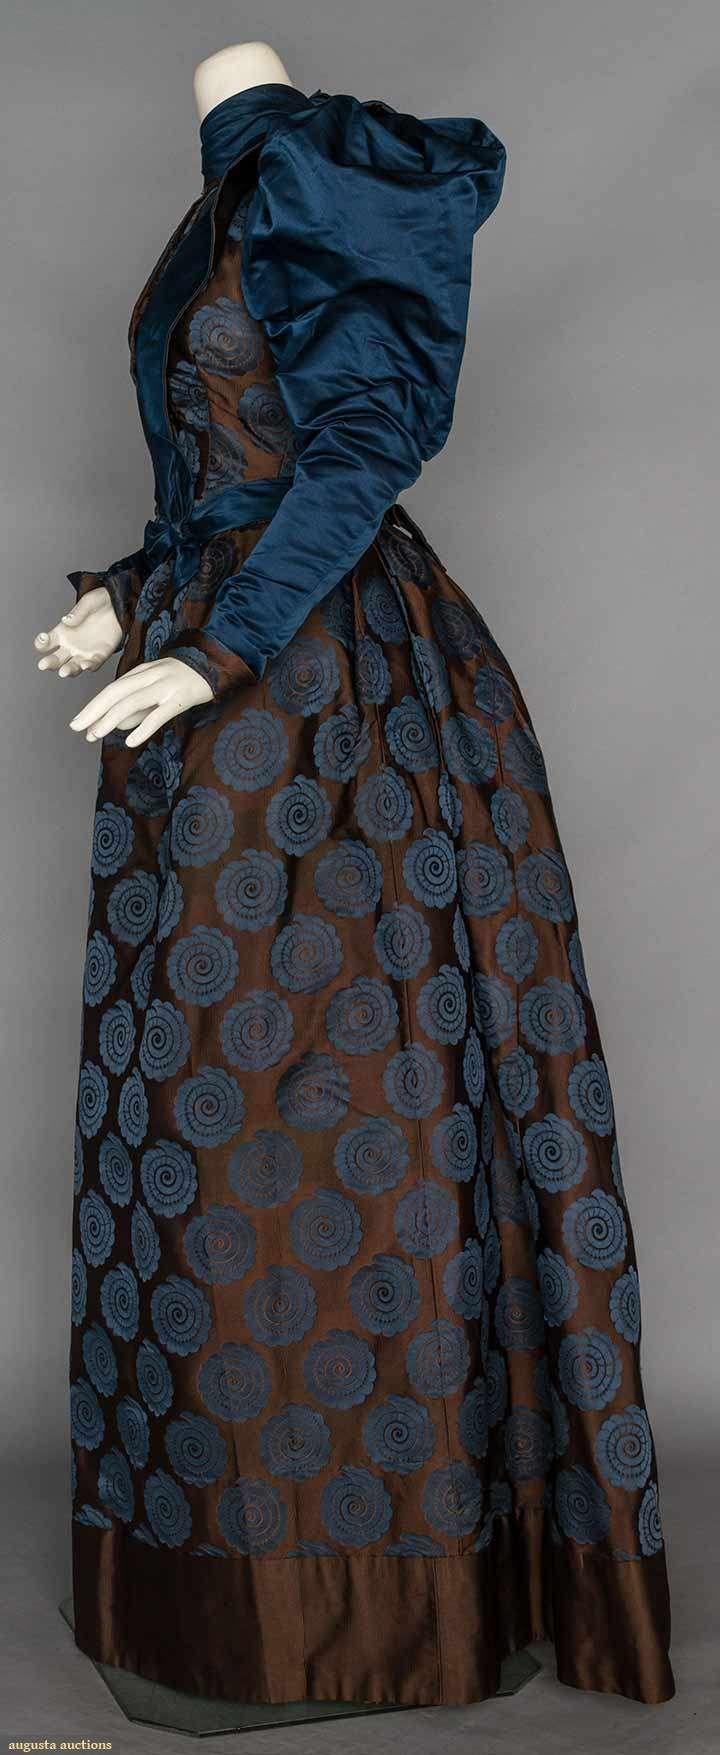 SILK BROCADE AFTERNOON DRESS, c. 1895. 2-piece of brown satin brocade w/ blue spiral rondels, blue satin high collar, lapels & gigot sleeves. Sideway